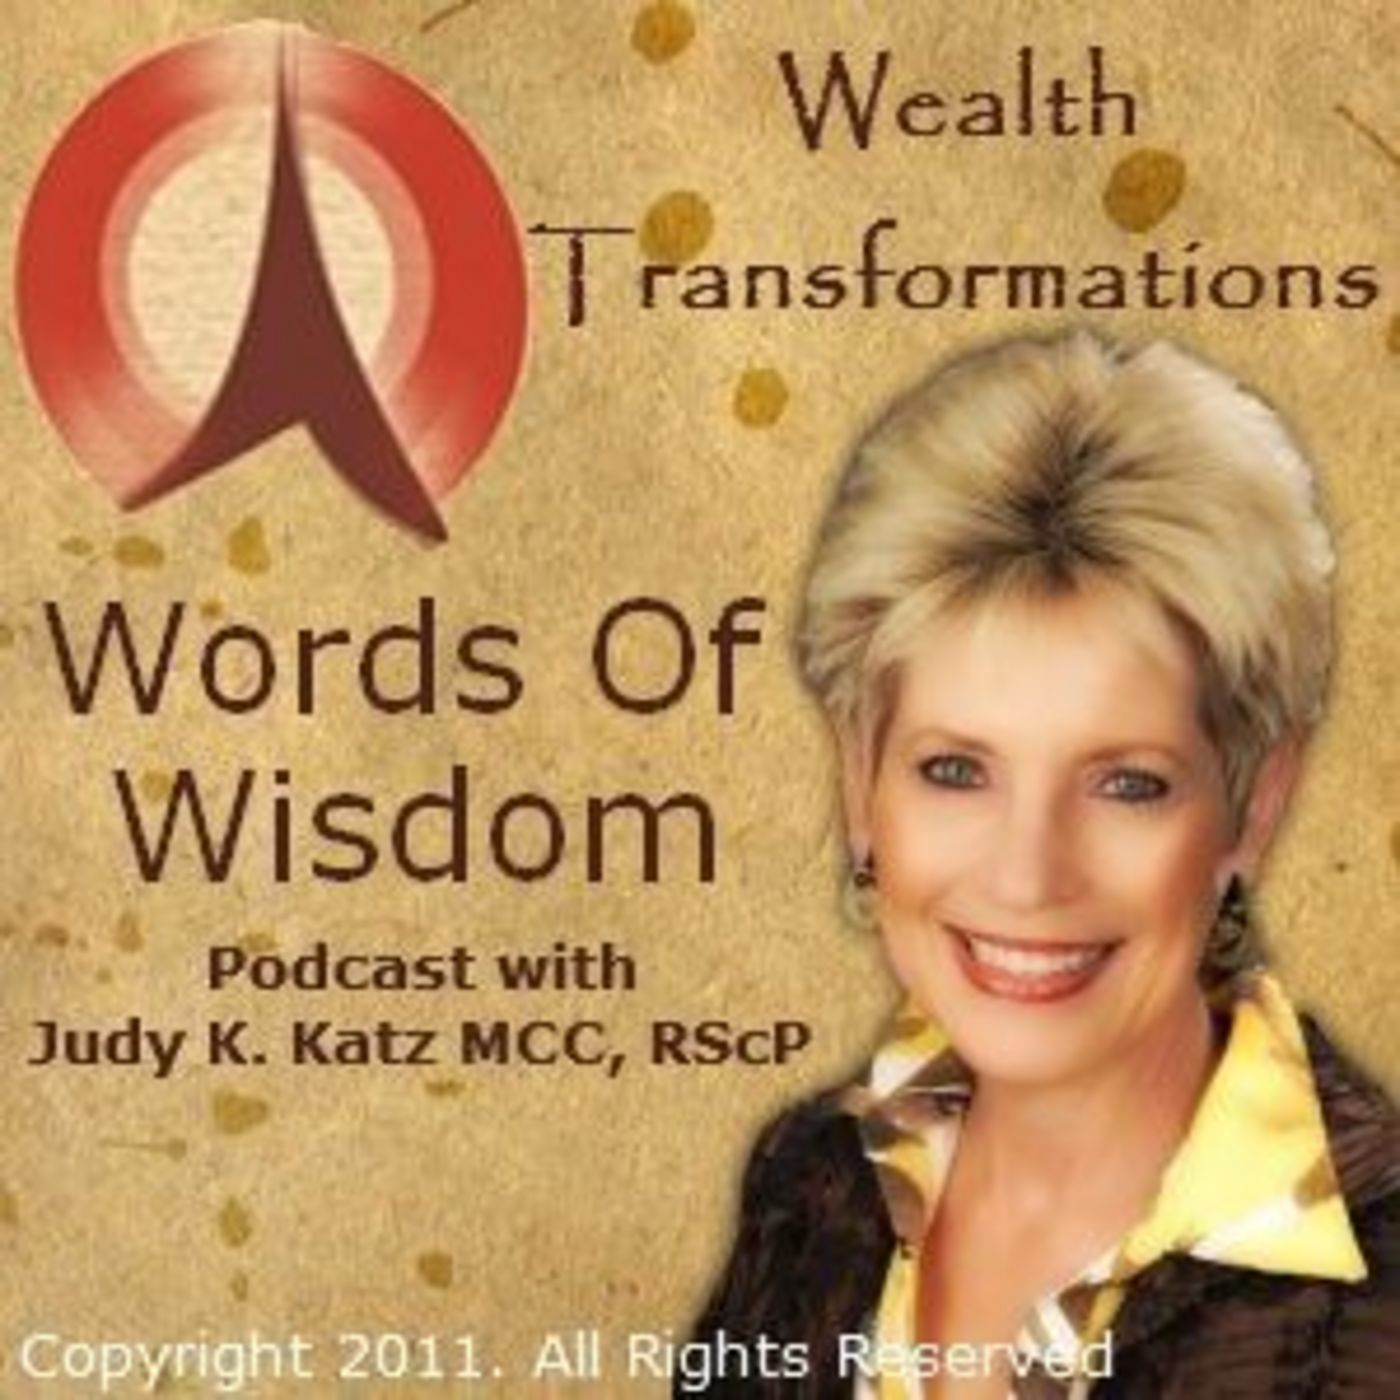 <![CDATA[Wealth Transformations Words of Wisdom Podcast]]>